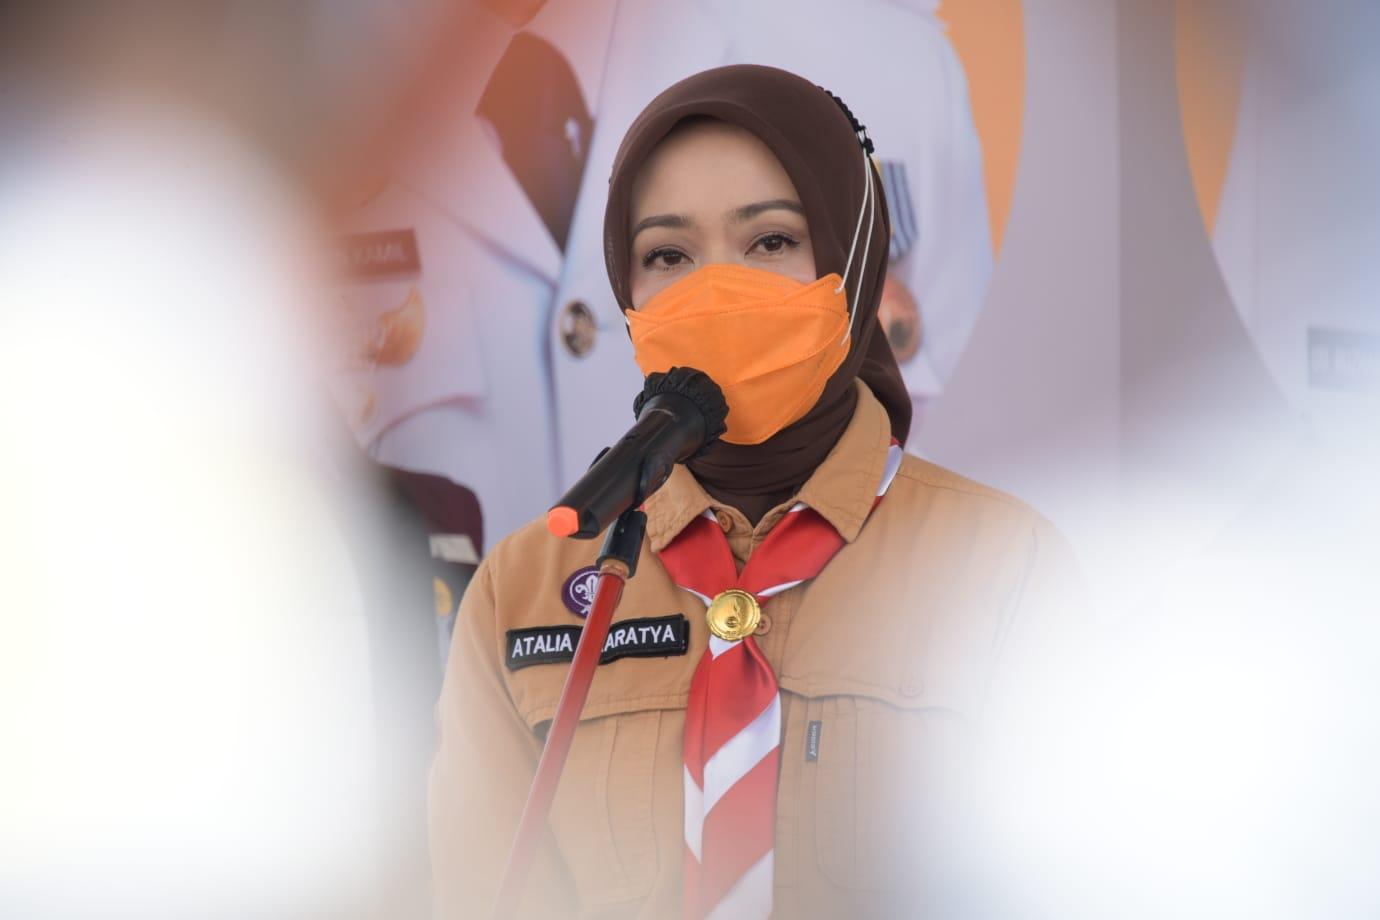 PERCEPATAN VAKSIN Wakil Ketua Devisi Khusus Jabar Tangtangannya Berat 2